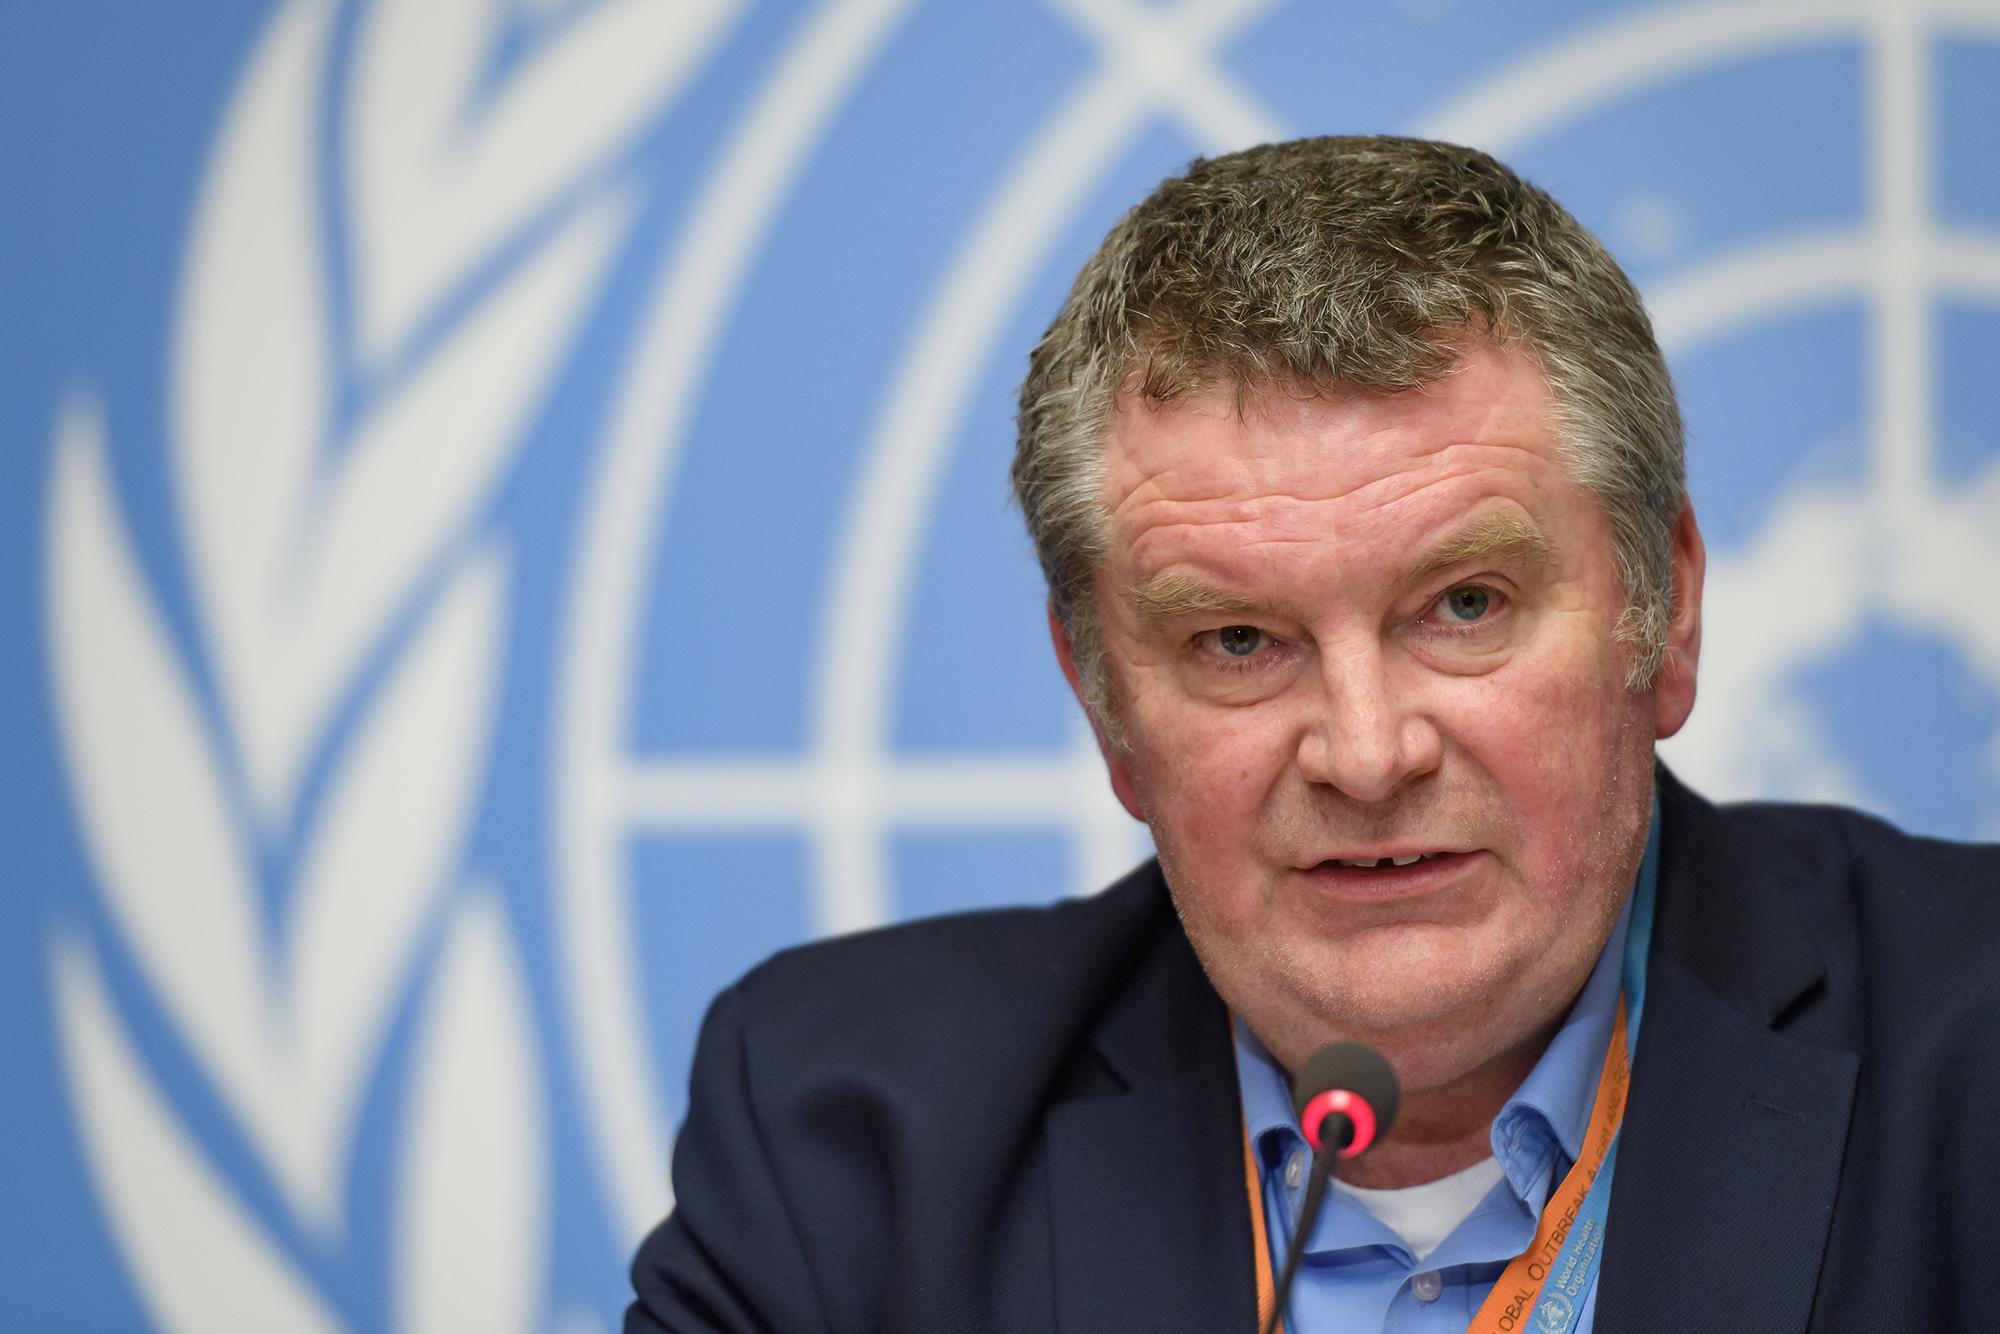 World Health Organization's Health Emergencies Programme executive director Dr. Michael Ryan on January 29 in Geneva, Switzerland.